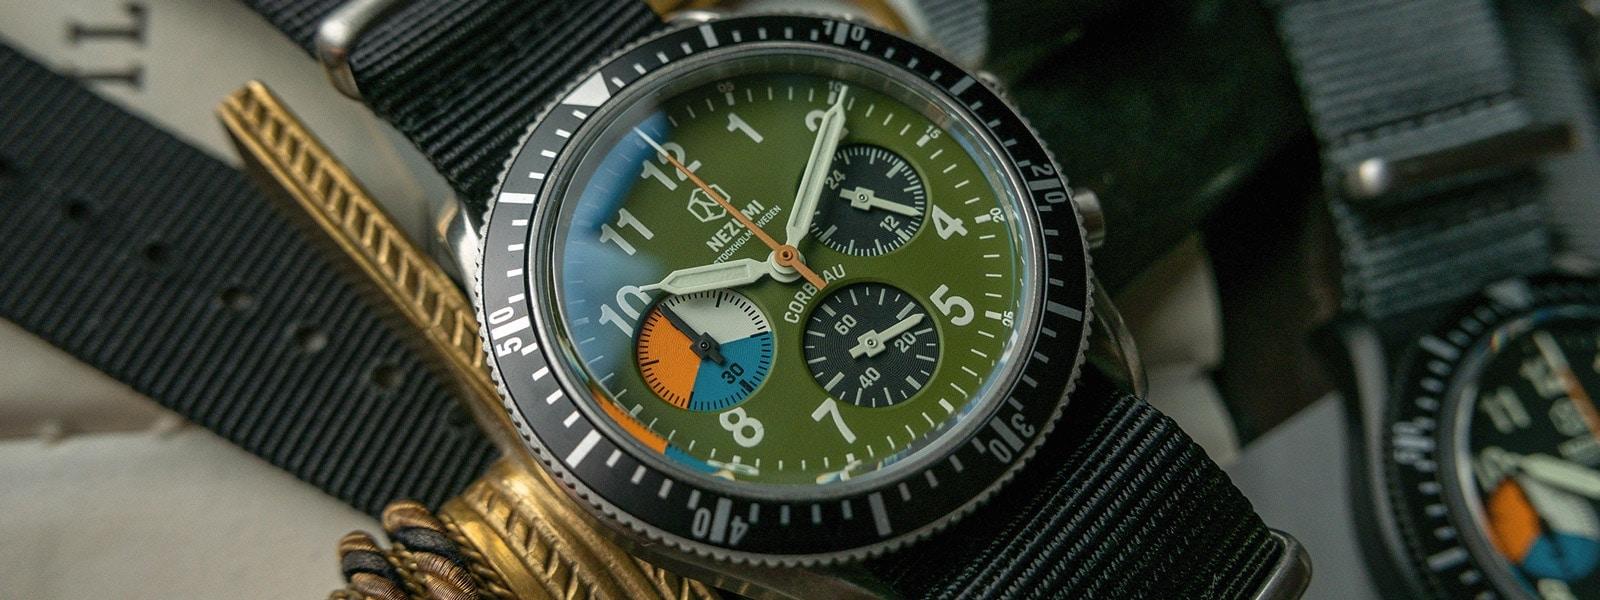 Nezumi Studios Watch Corbeau CQ1.402 military chronograph with nato strap